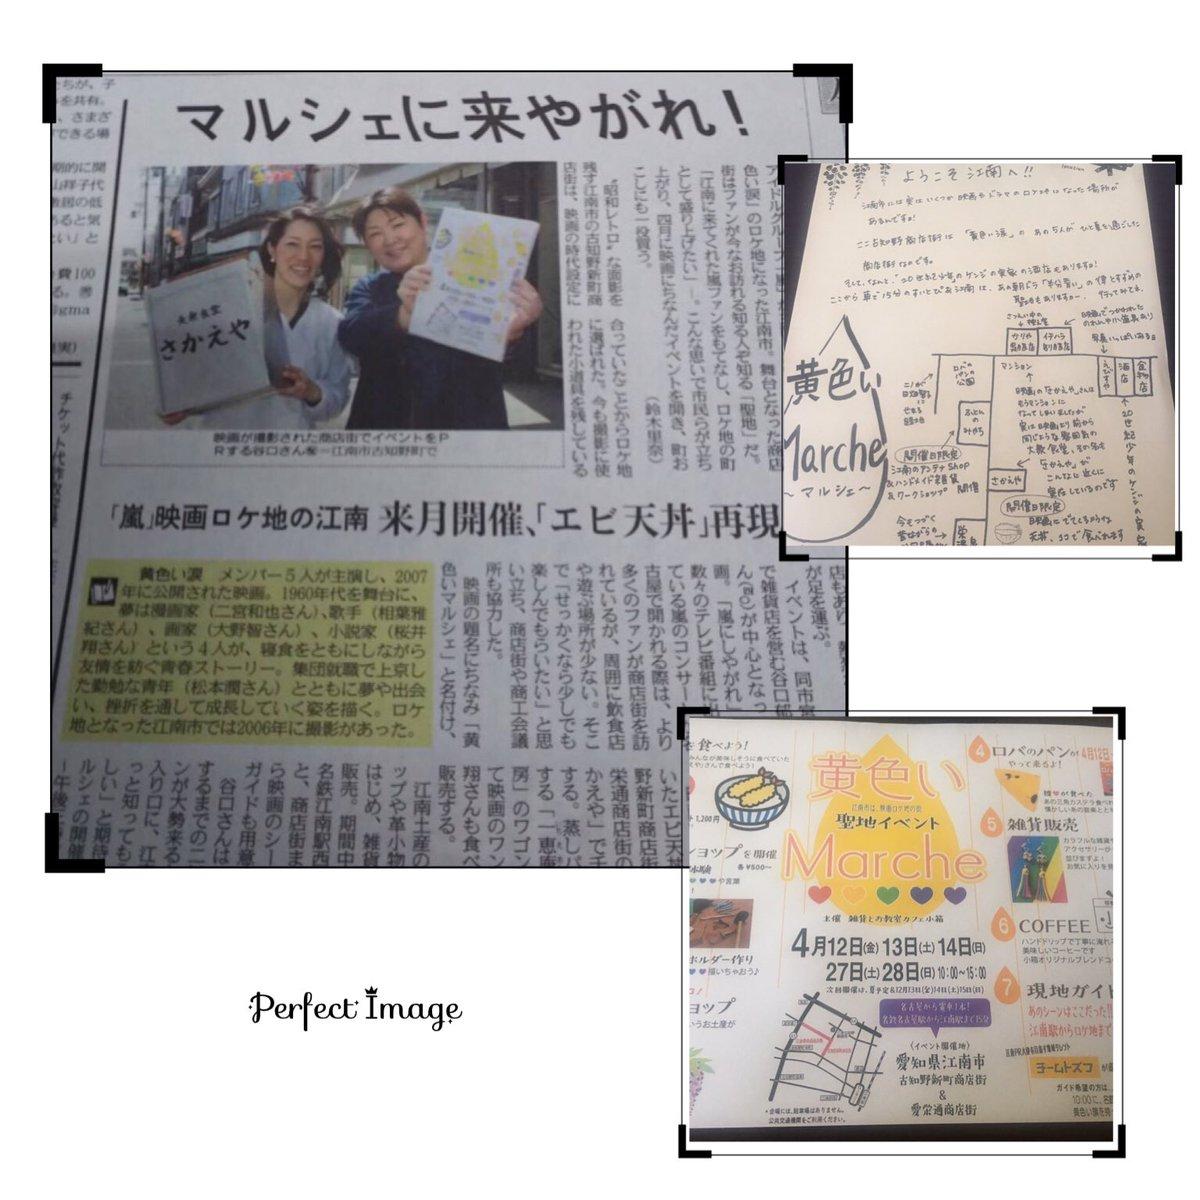 D2vic5EU8AE7Wa8 - 2019年3月28日 #嵐 Twitterまとめ01